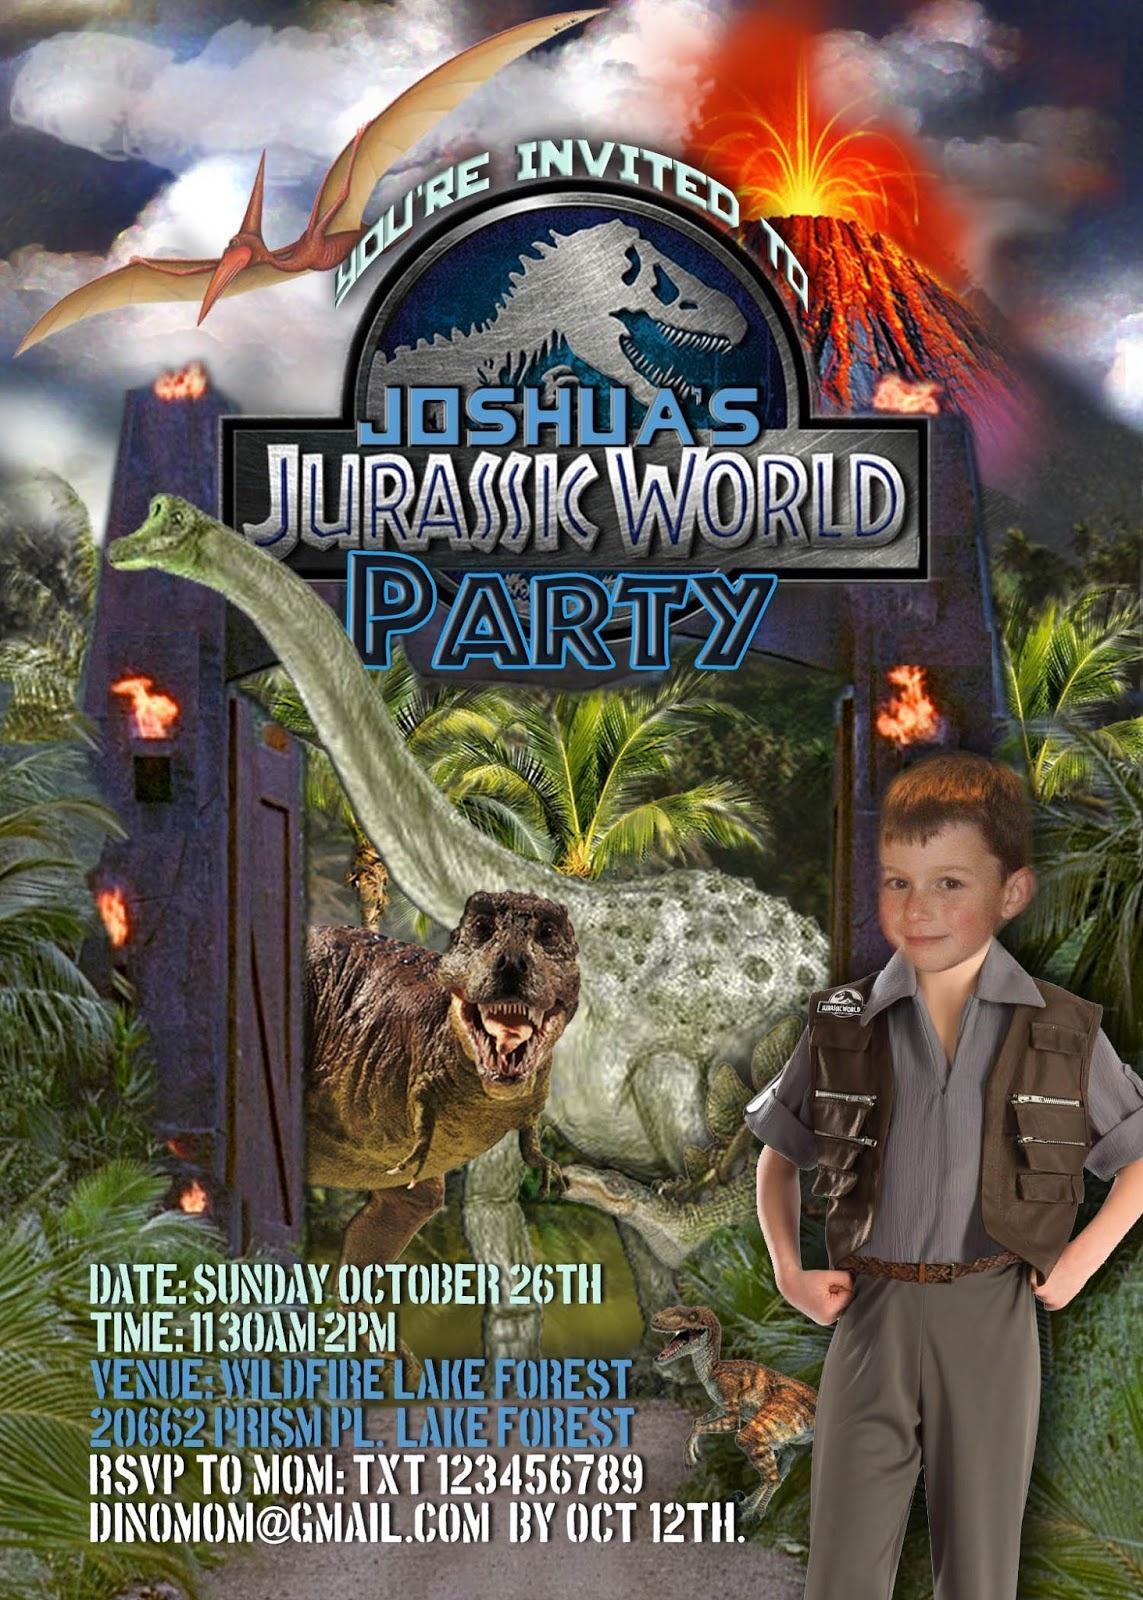 Free Kids Party Invitations - Free Printable Jurassic World Invitations